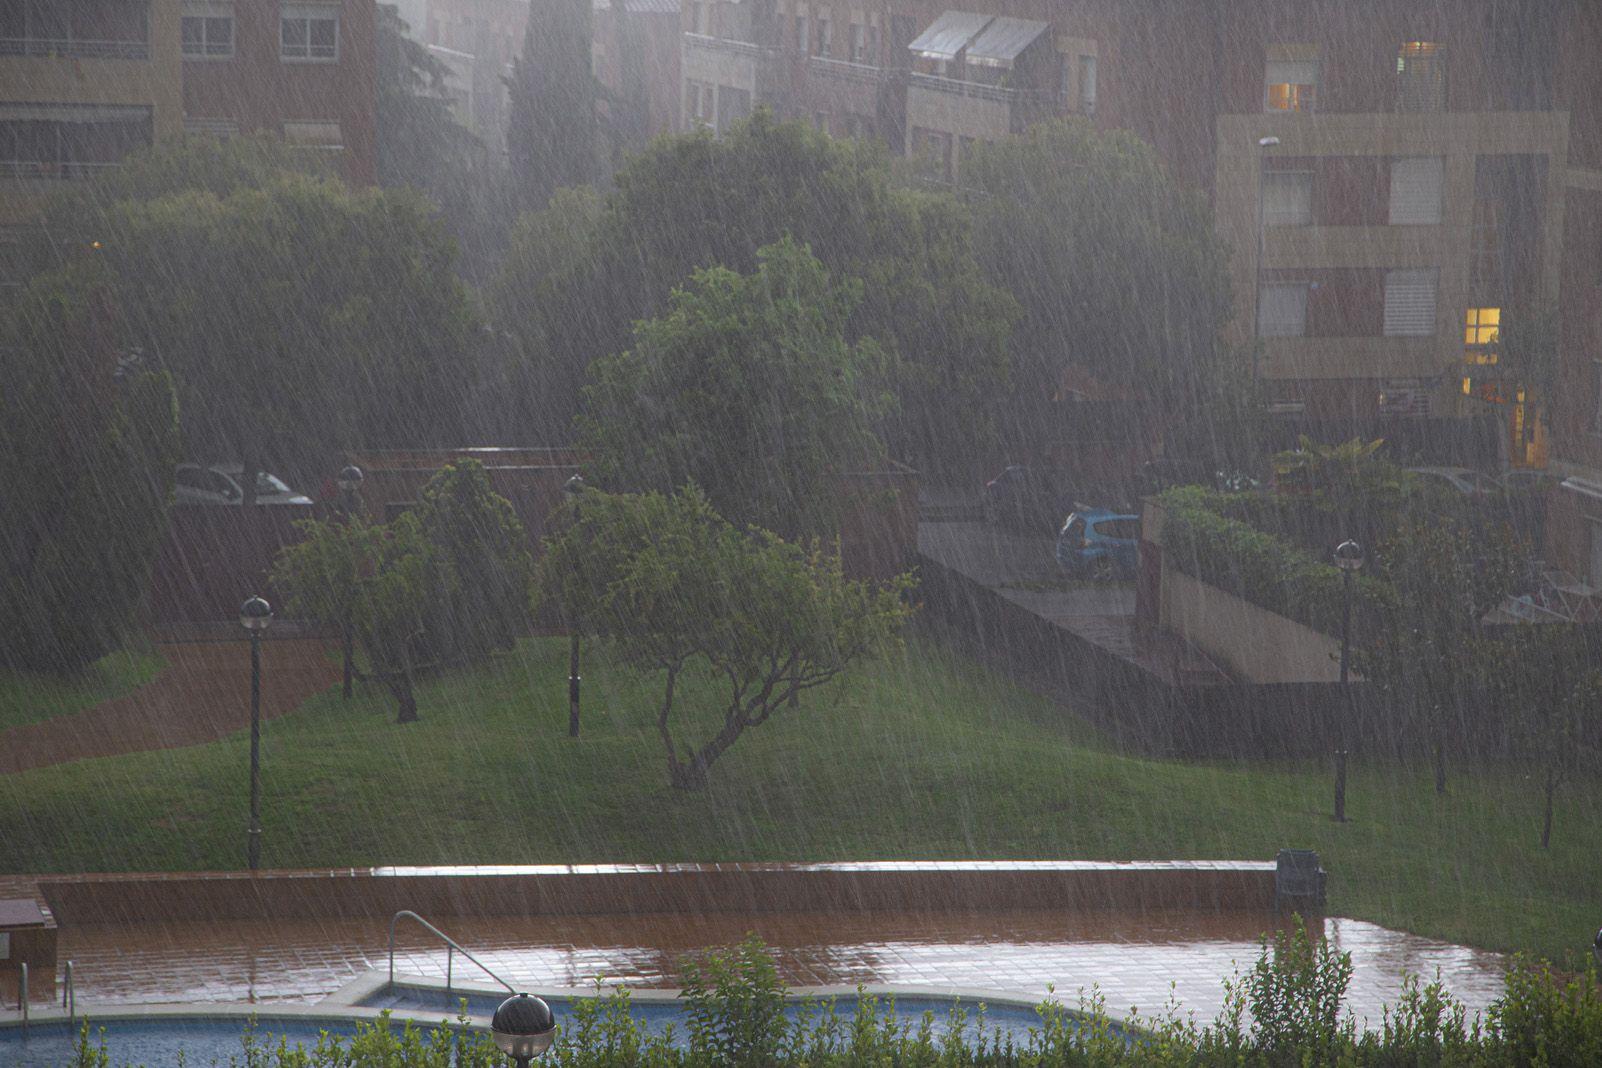 Pluja durant la darrera tempesta a Sant Cugat. Foto: Cedida.